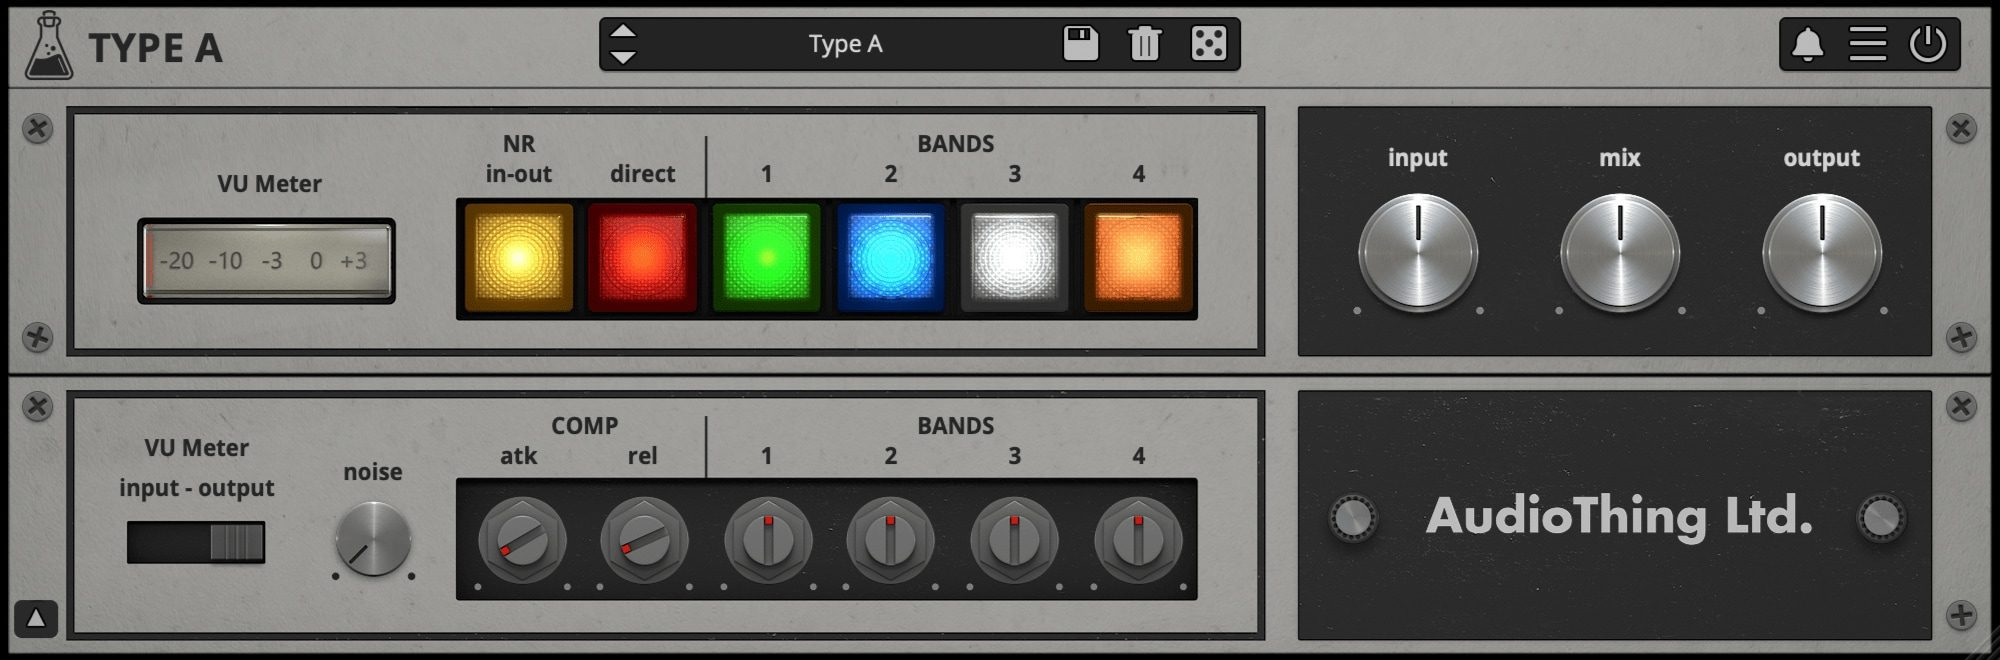 Type A GUI 2x